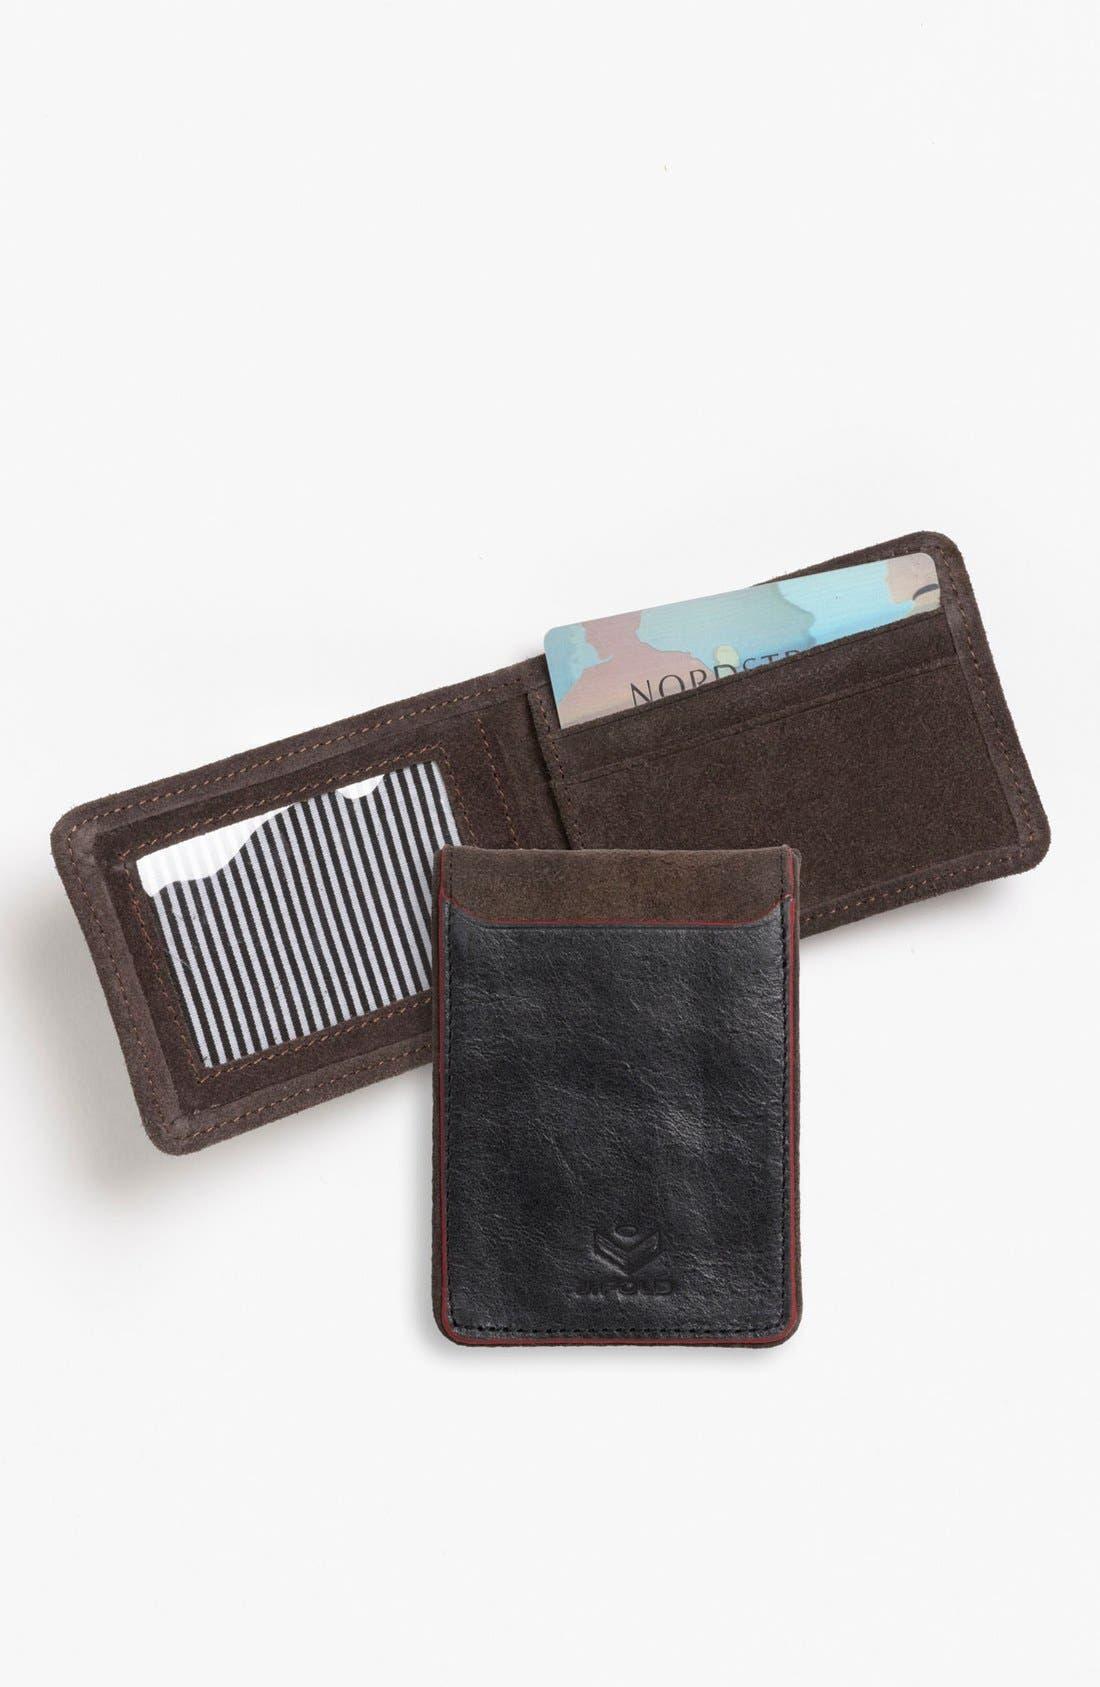 Alternate Image 1 Selected - J Fold 'Smokestack' Folding Card Holder